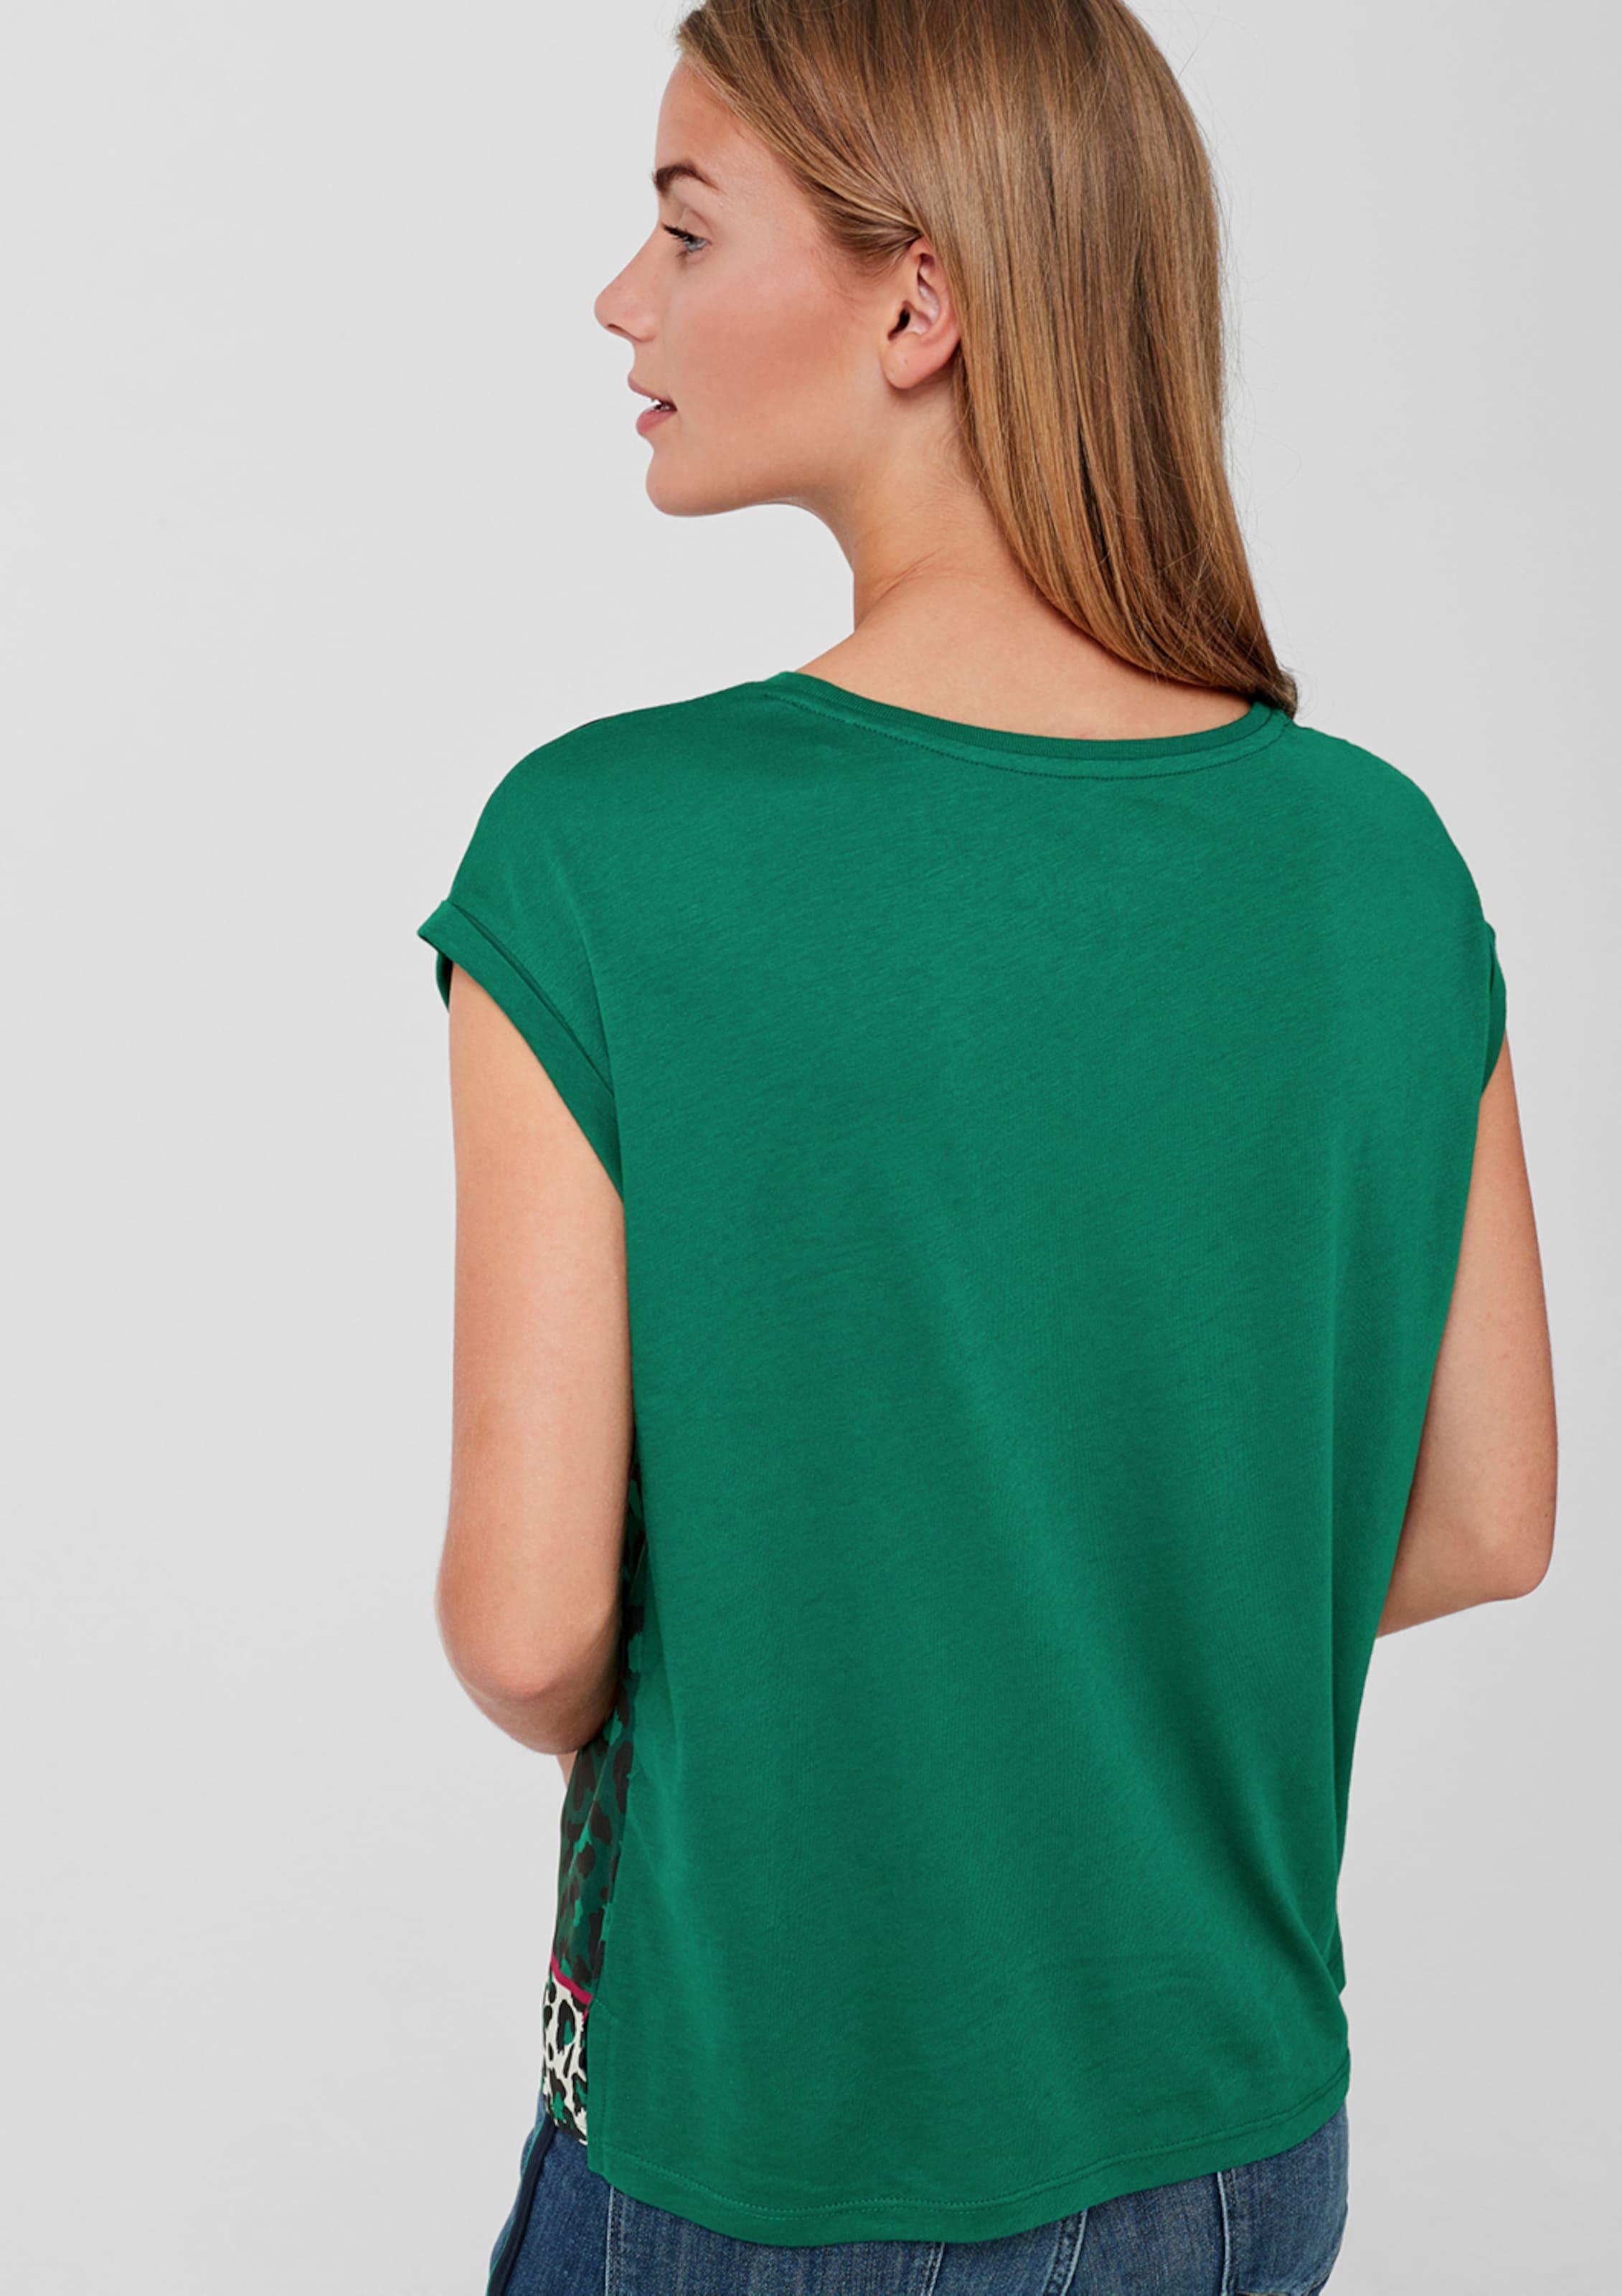 oliver Blusenshirt oliver In S S S Blusenshirt Grün In Grün n0POwk